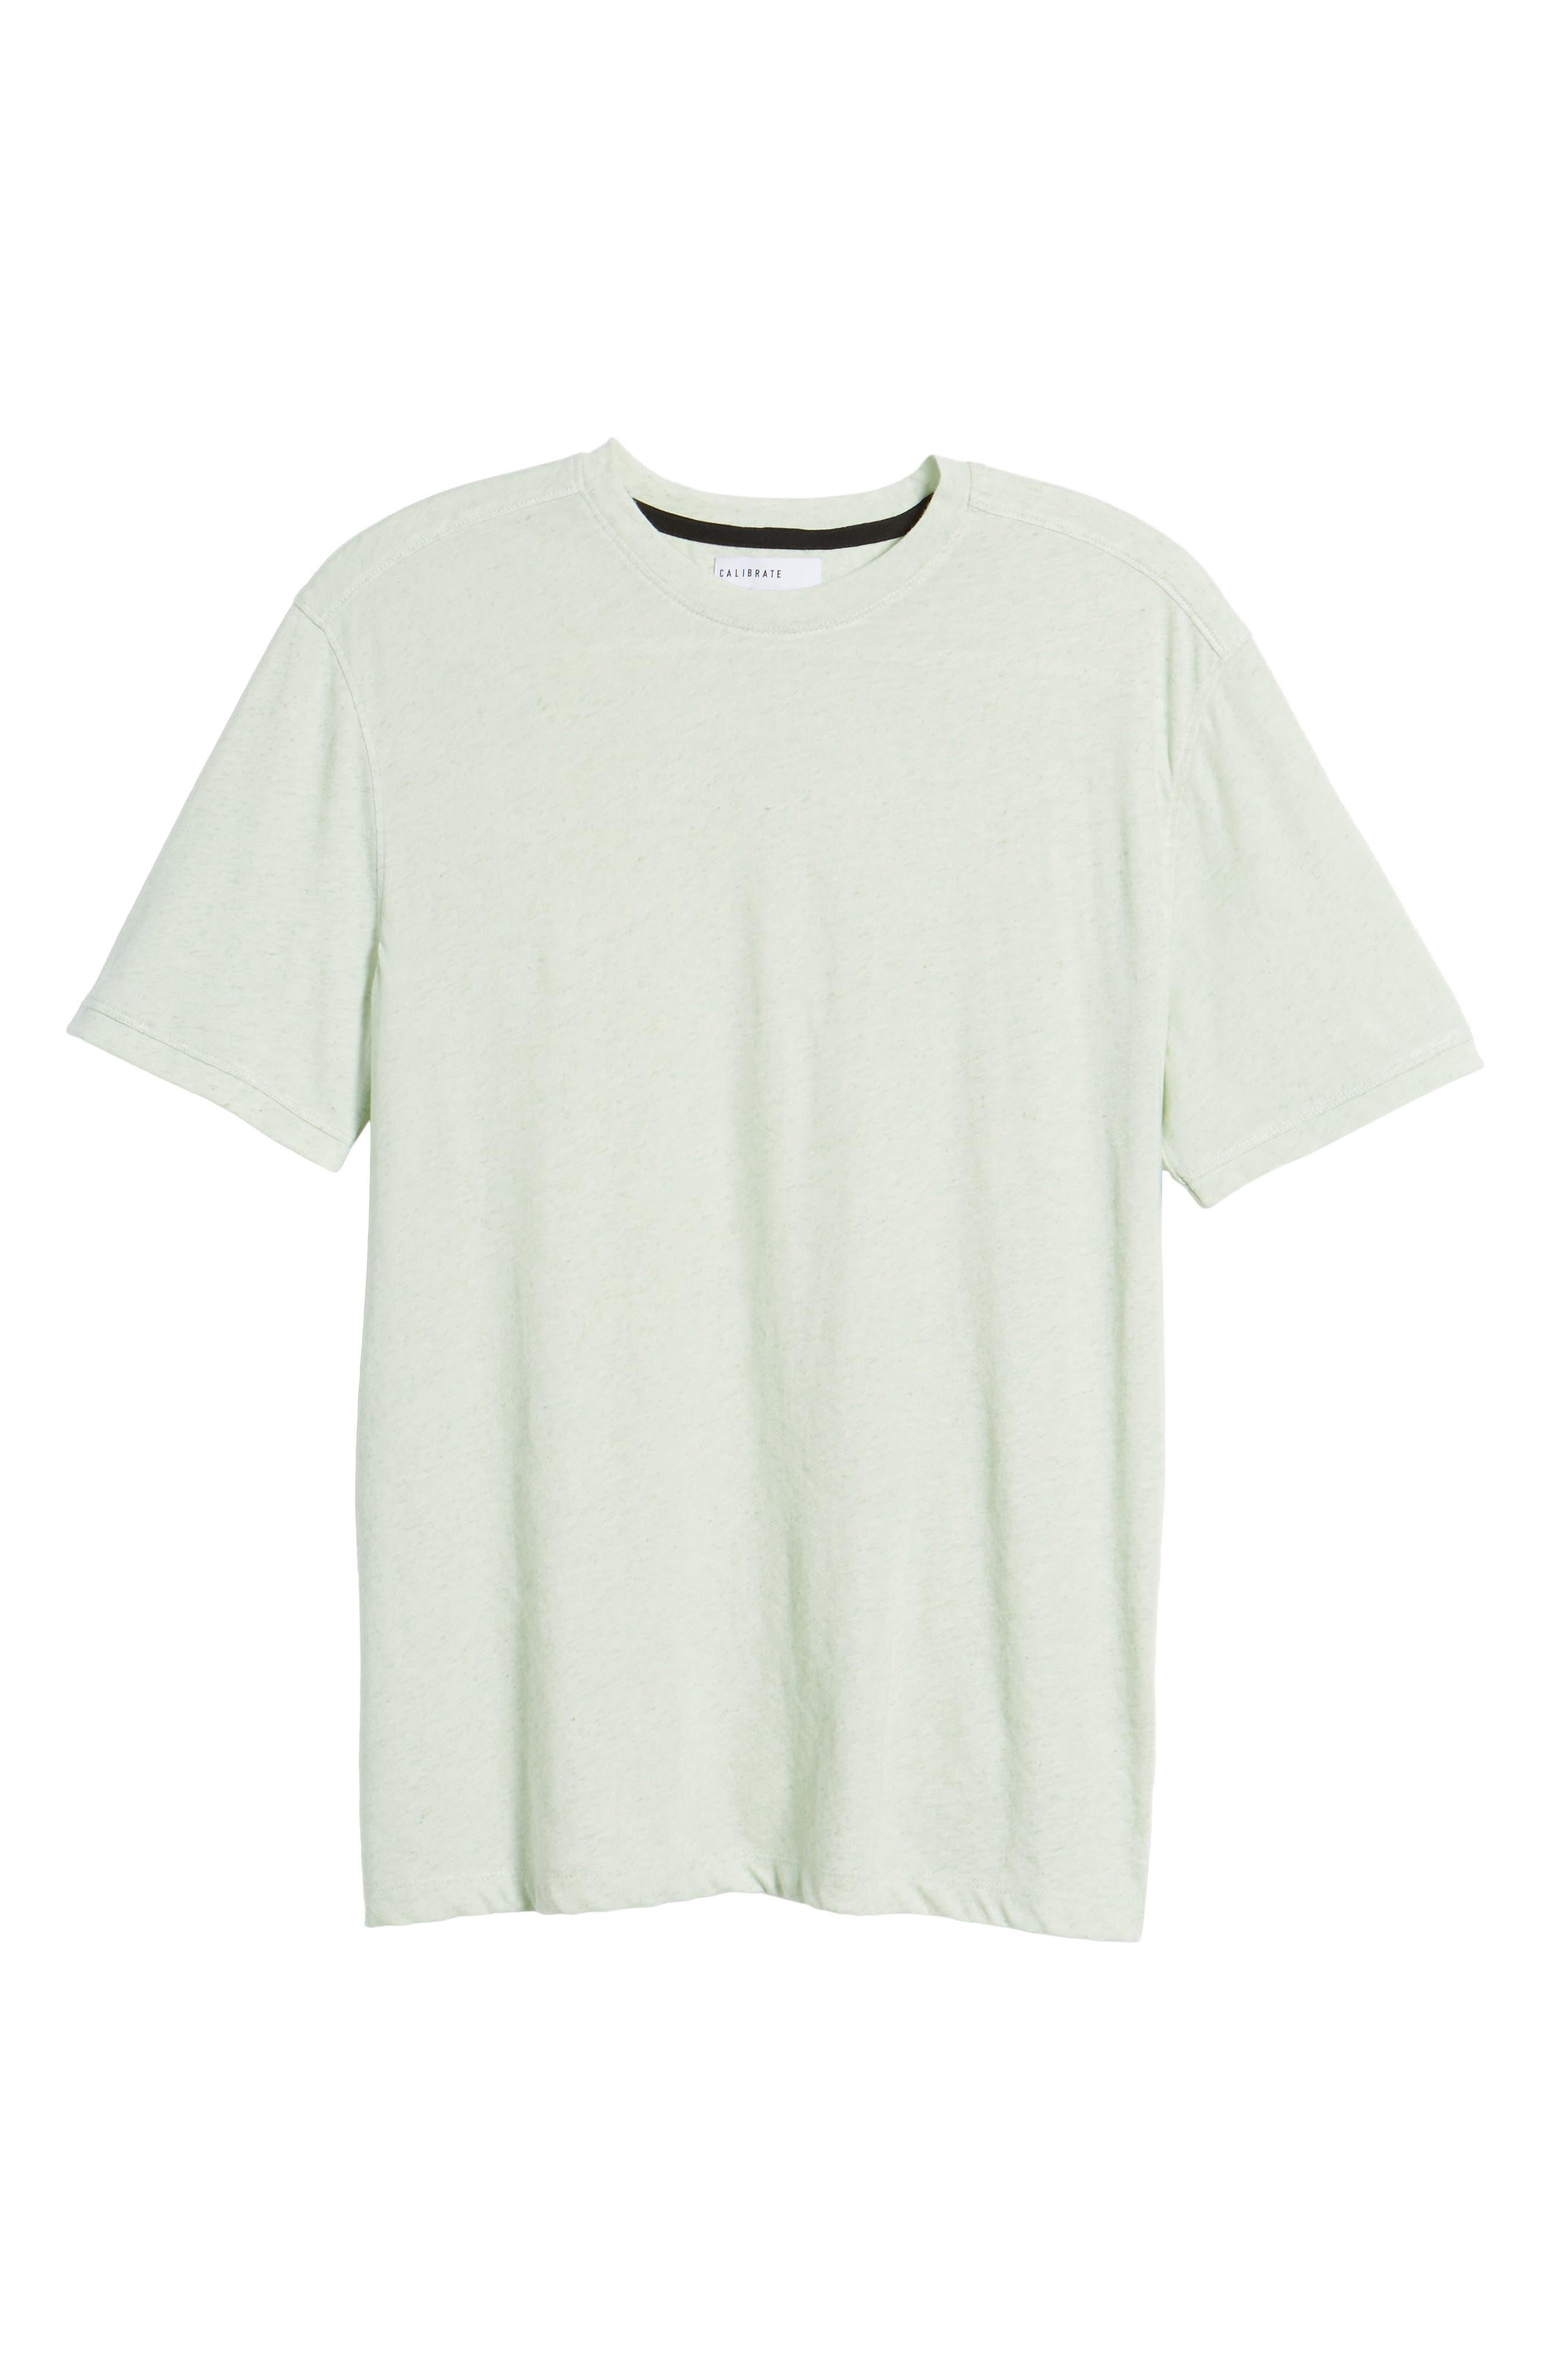 Crewneck T-Shirt,                             Alternate thumbnail 6, color,                             310